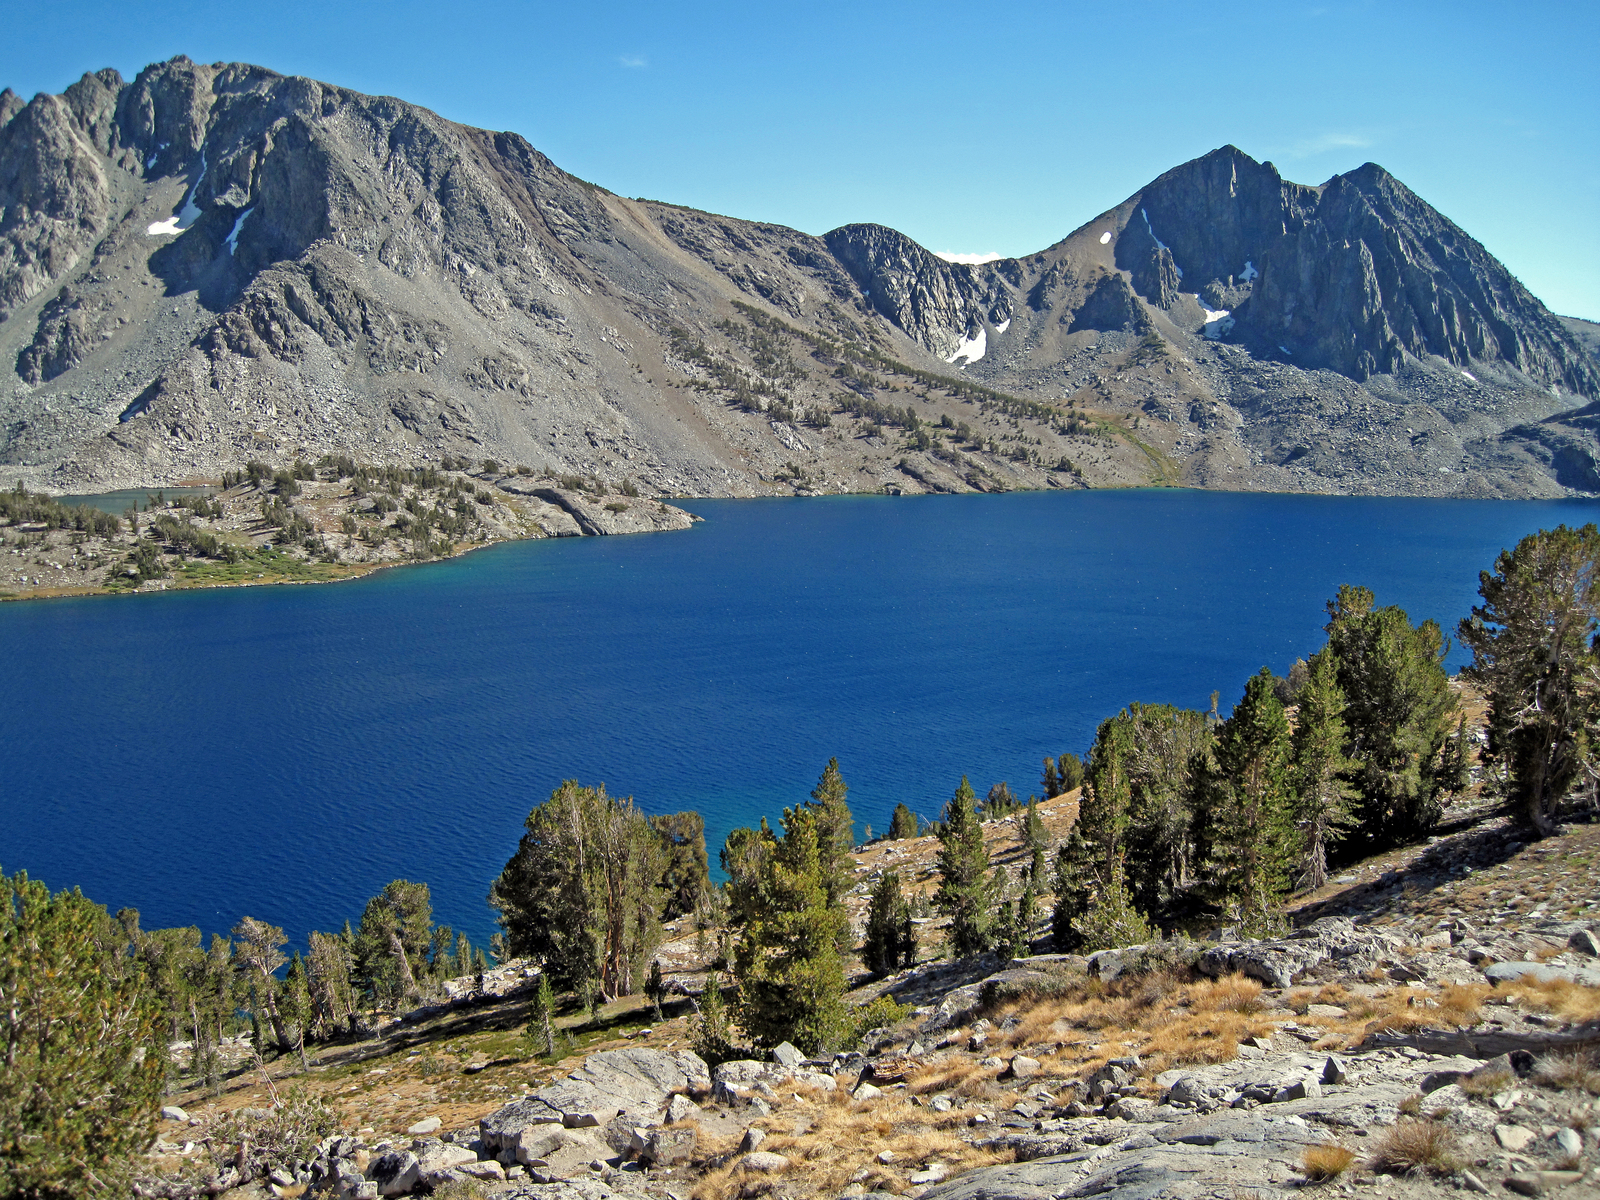 John Muir Wilderness, near Mammoth Lakes, California